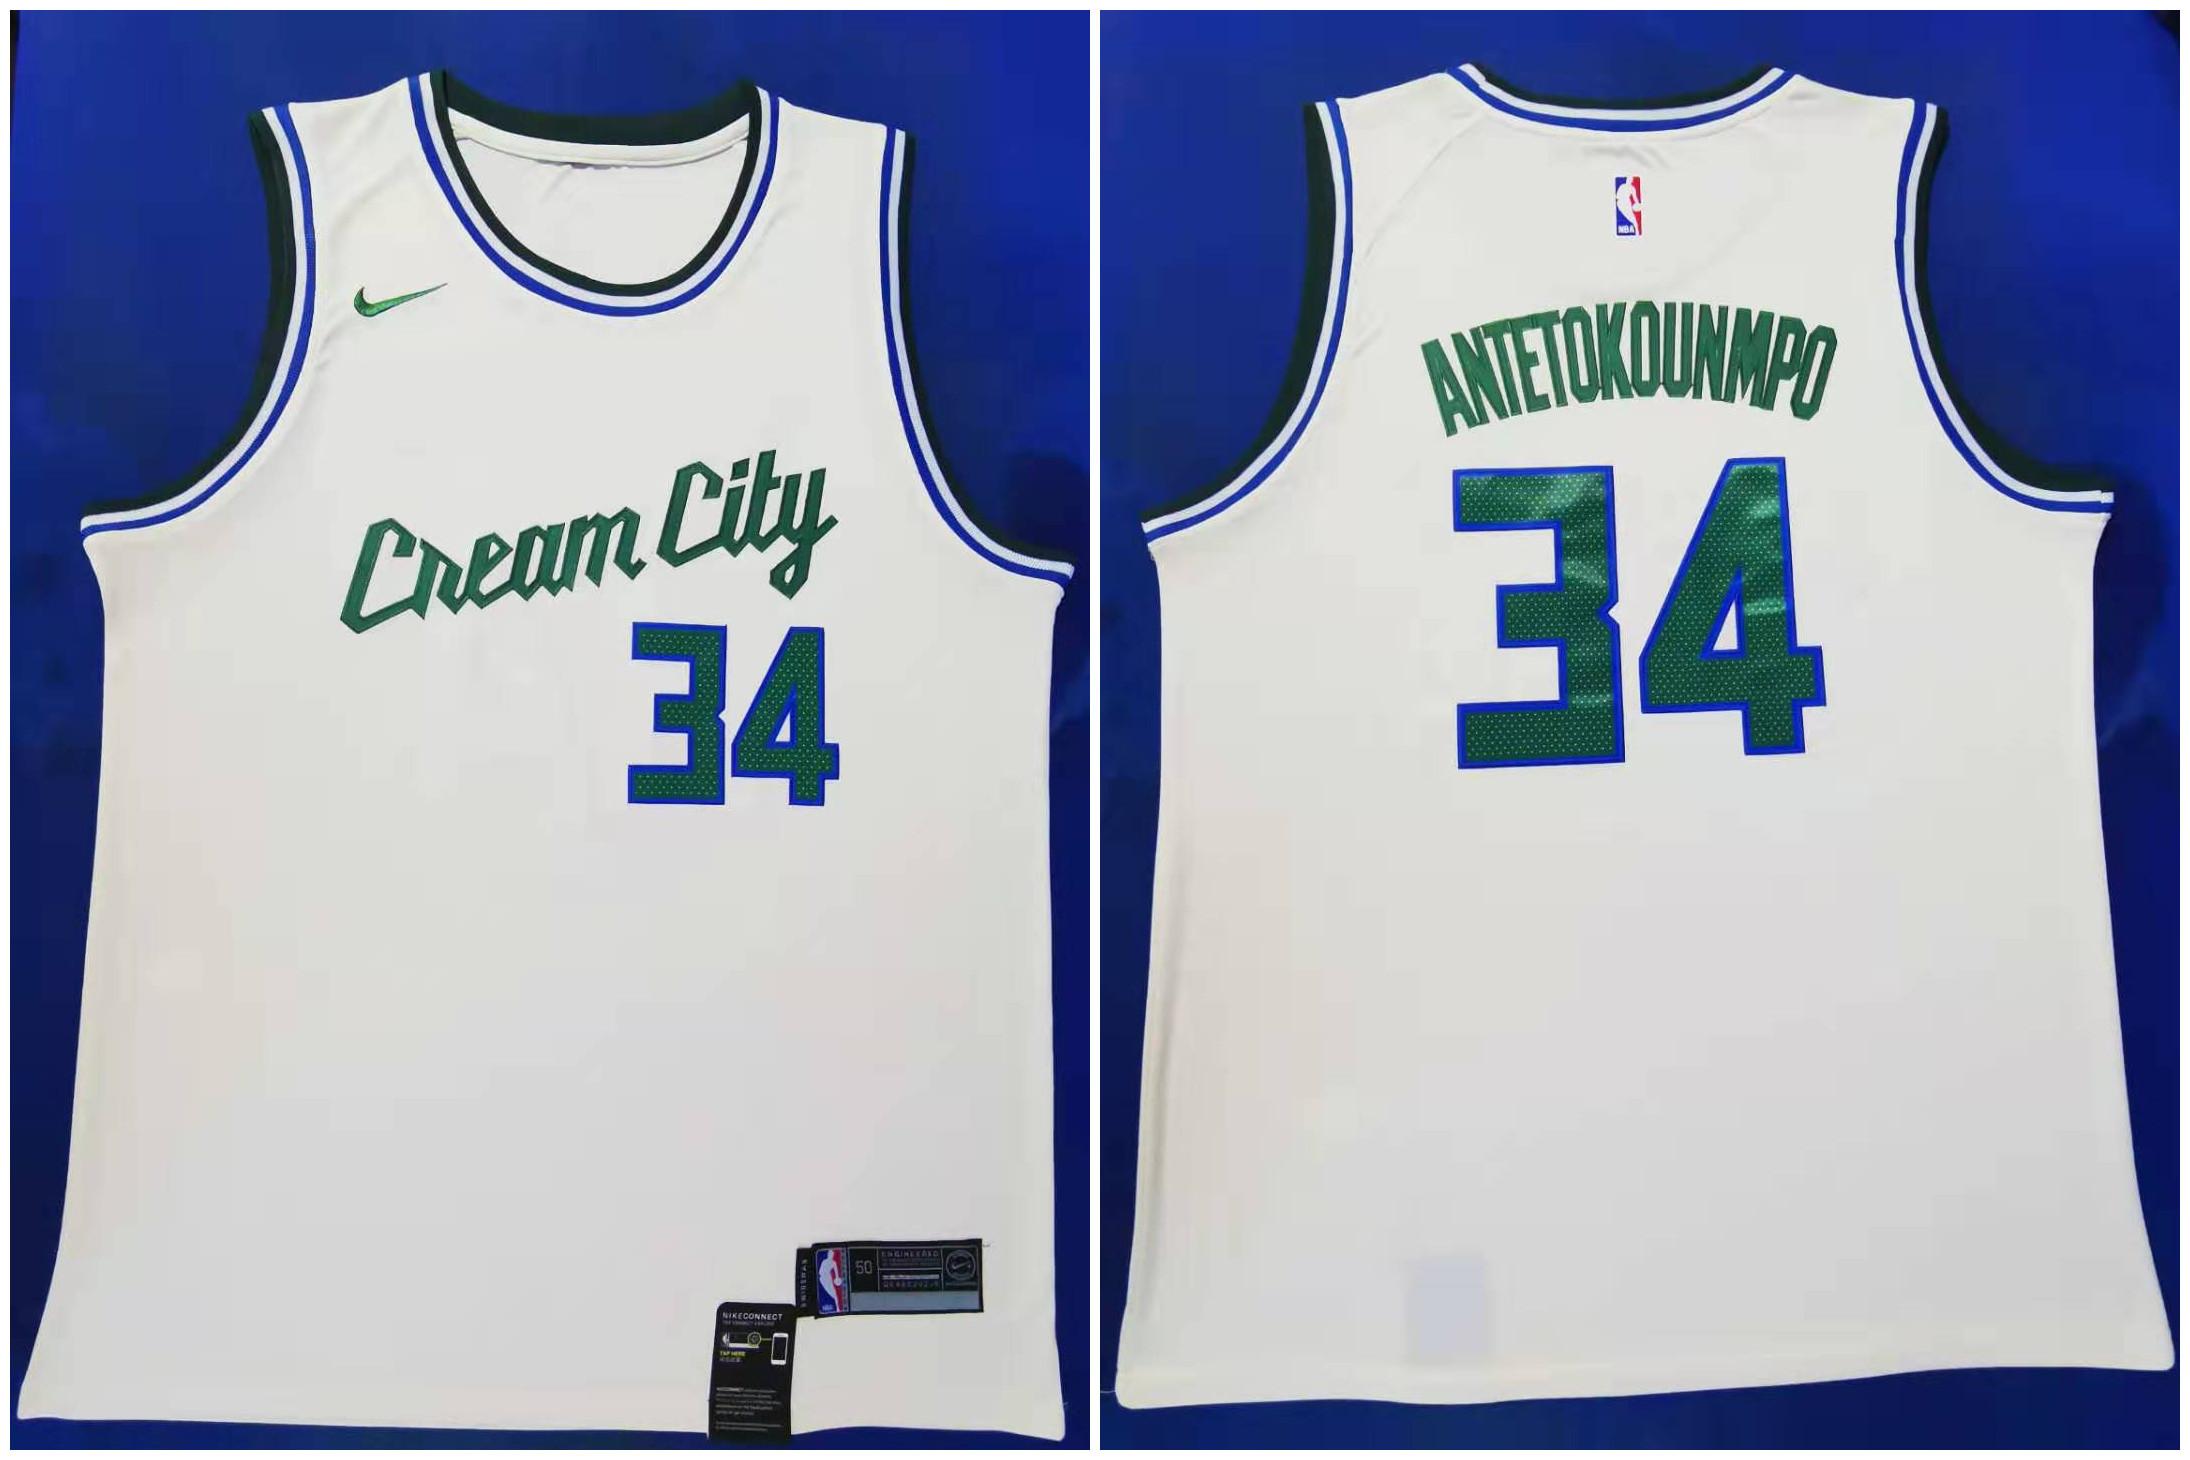 Bucks 34 Giannis Antetokounmpo Cream 2019-20 City Edition Nike Swingman Jersey